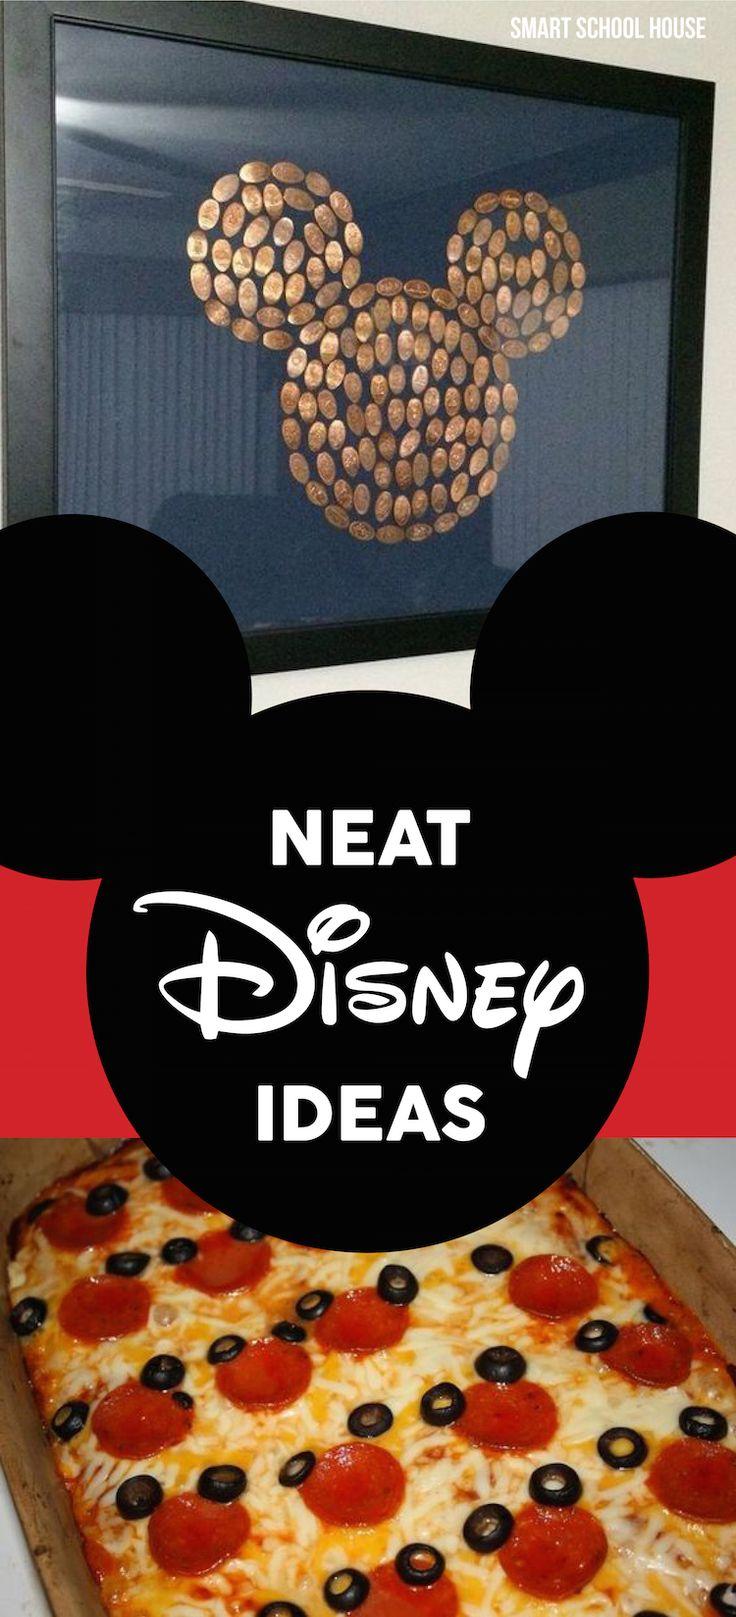 Neat Disney Ideas